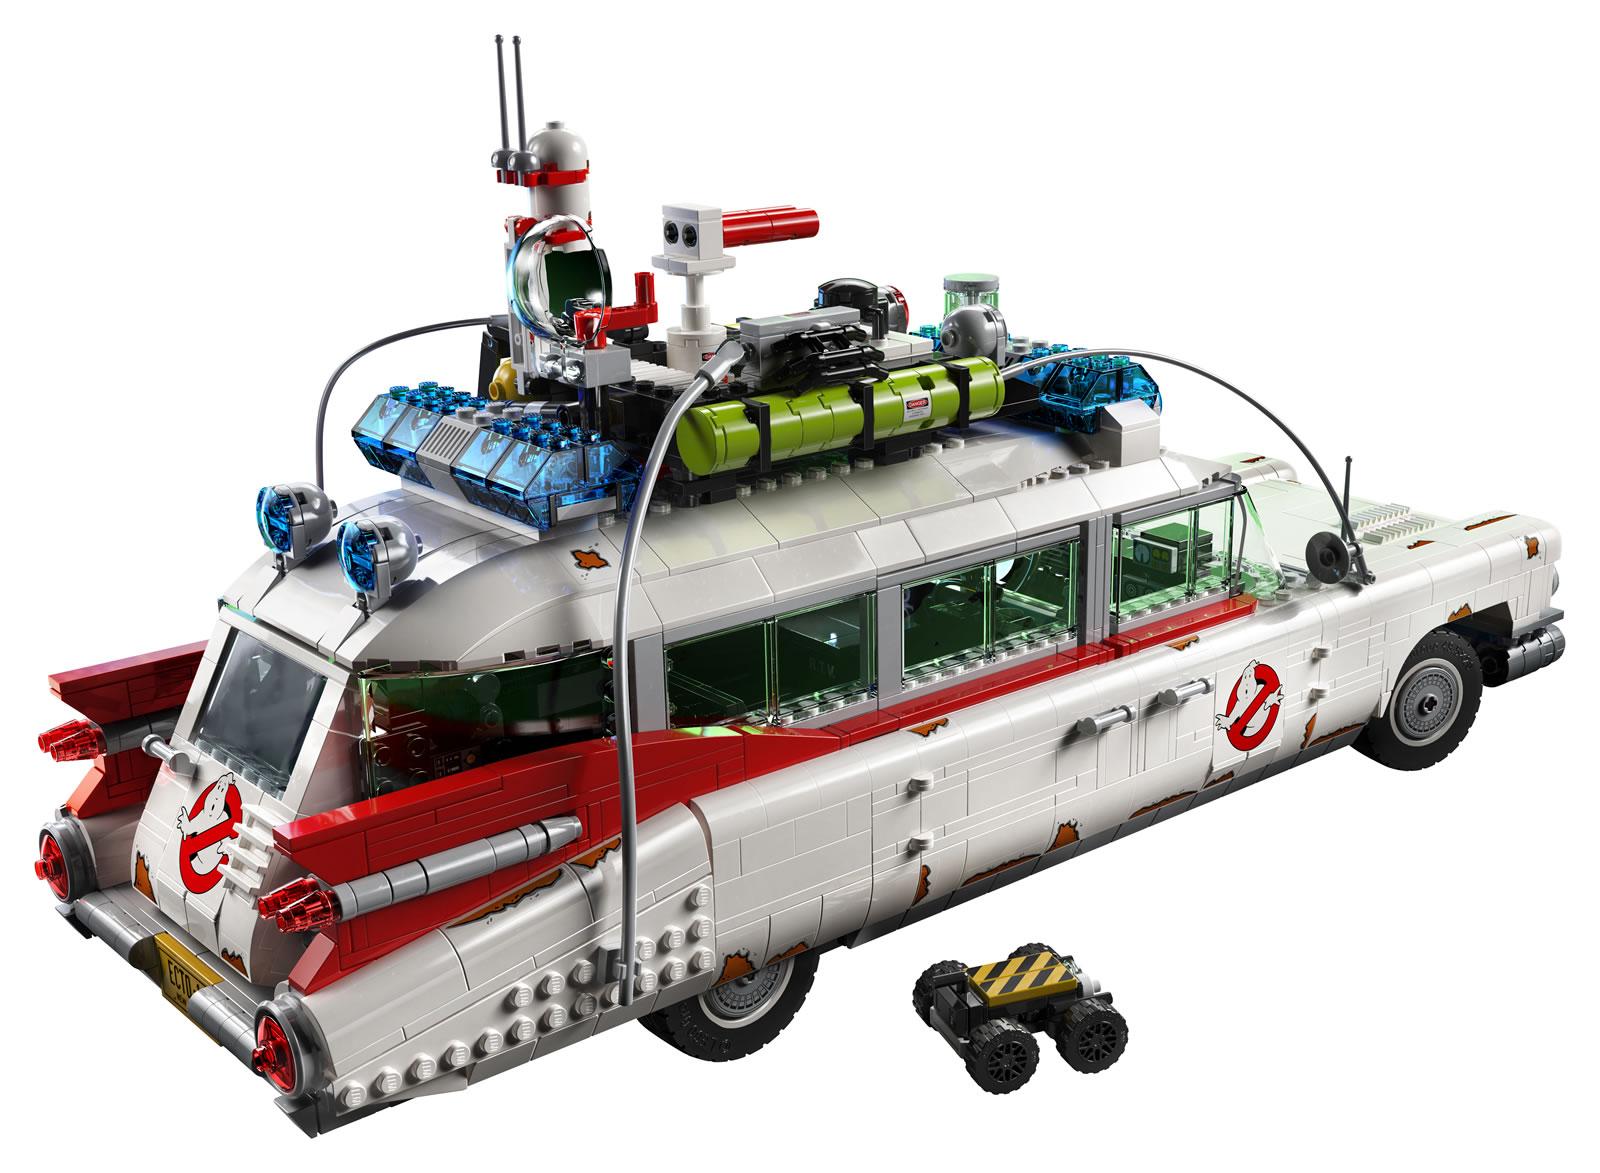 LEGO : Ze topik =) - Page 3 Lego-ghostbusters-ecto-1-10274_2